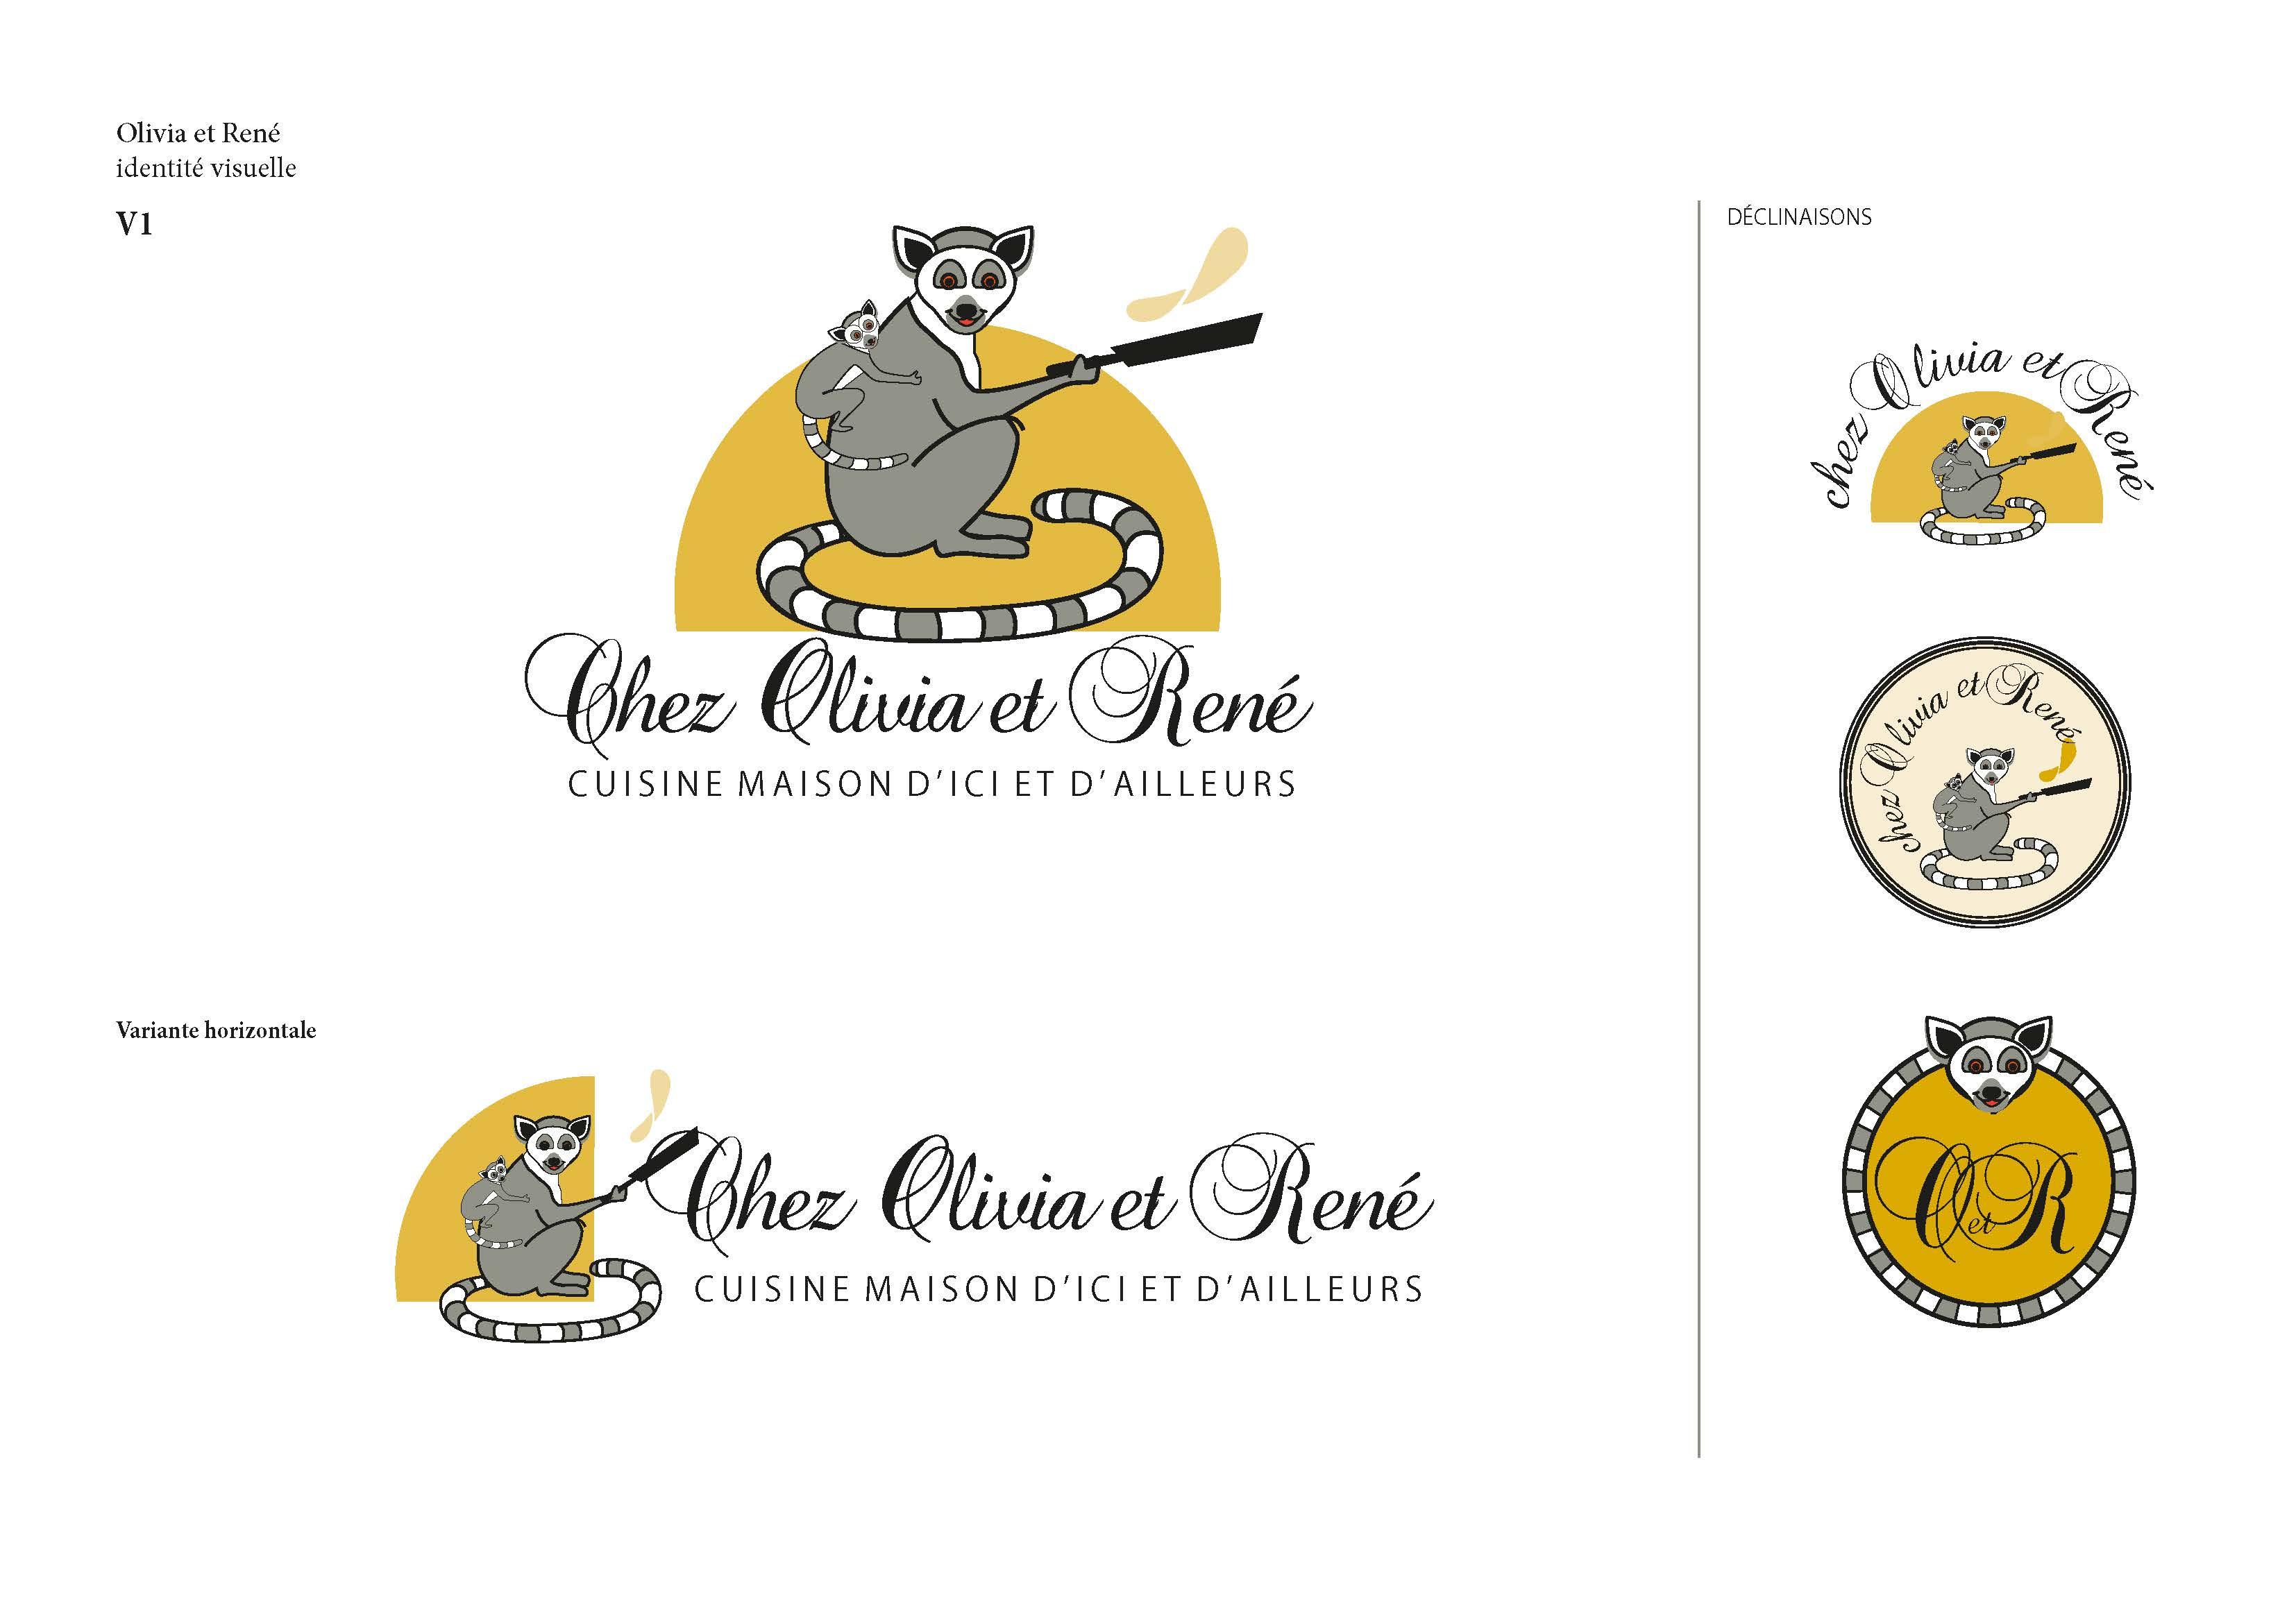 logo-Olivia et René-ConceptBoard_Page_1